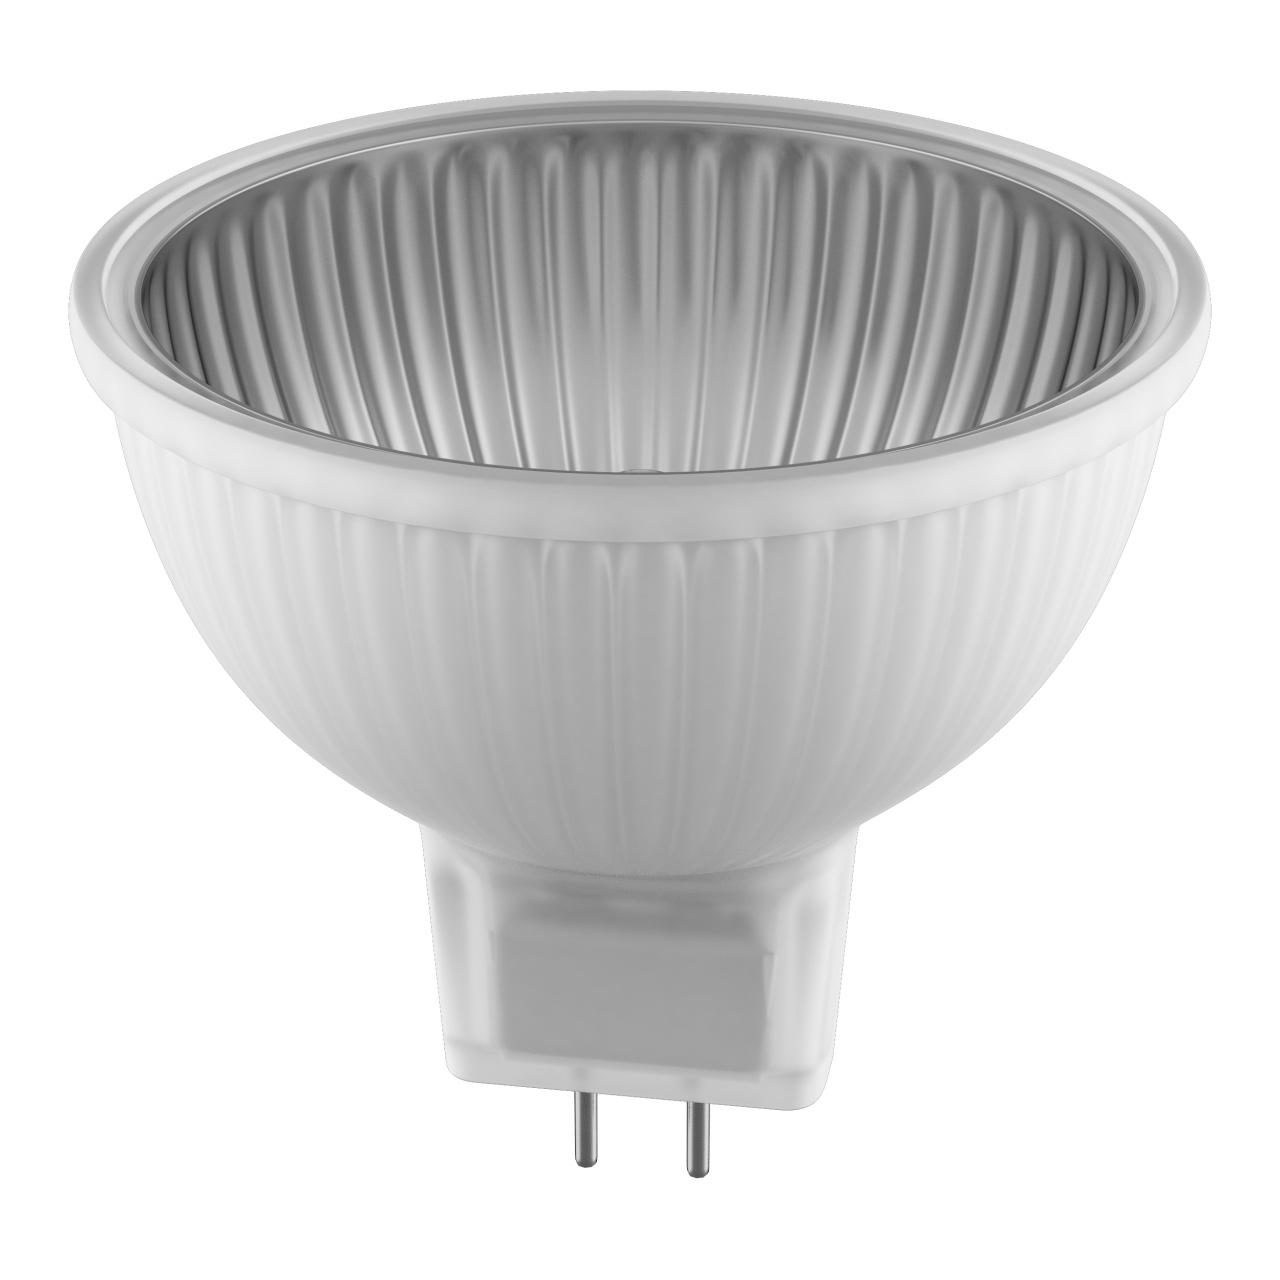 Лампа HAL 220V MR16 G5.3 50W 60G ALU RA100 2800K 2000H DIMM Lightstar 922107